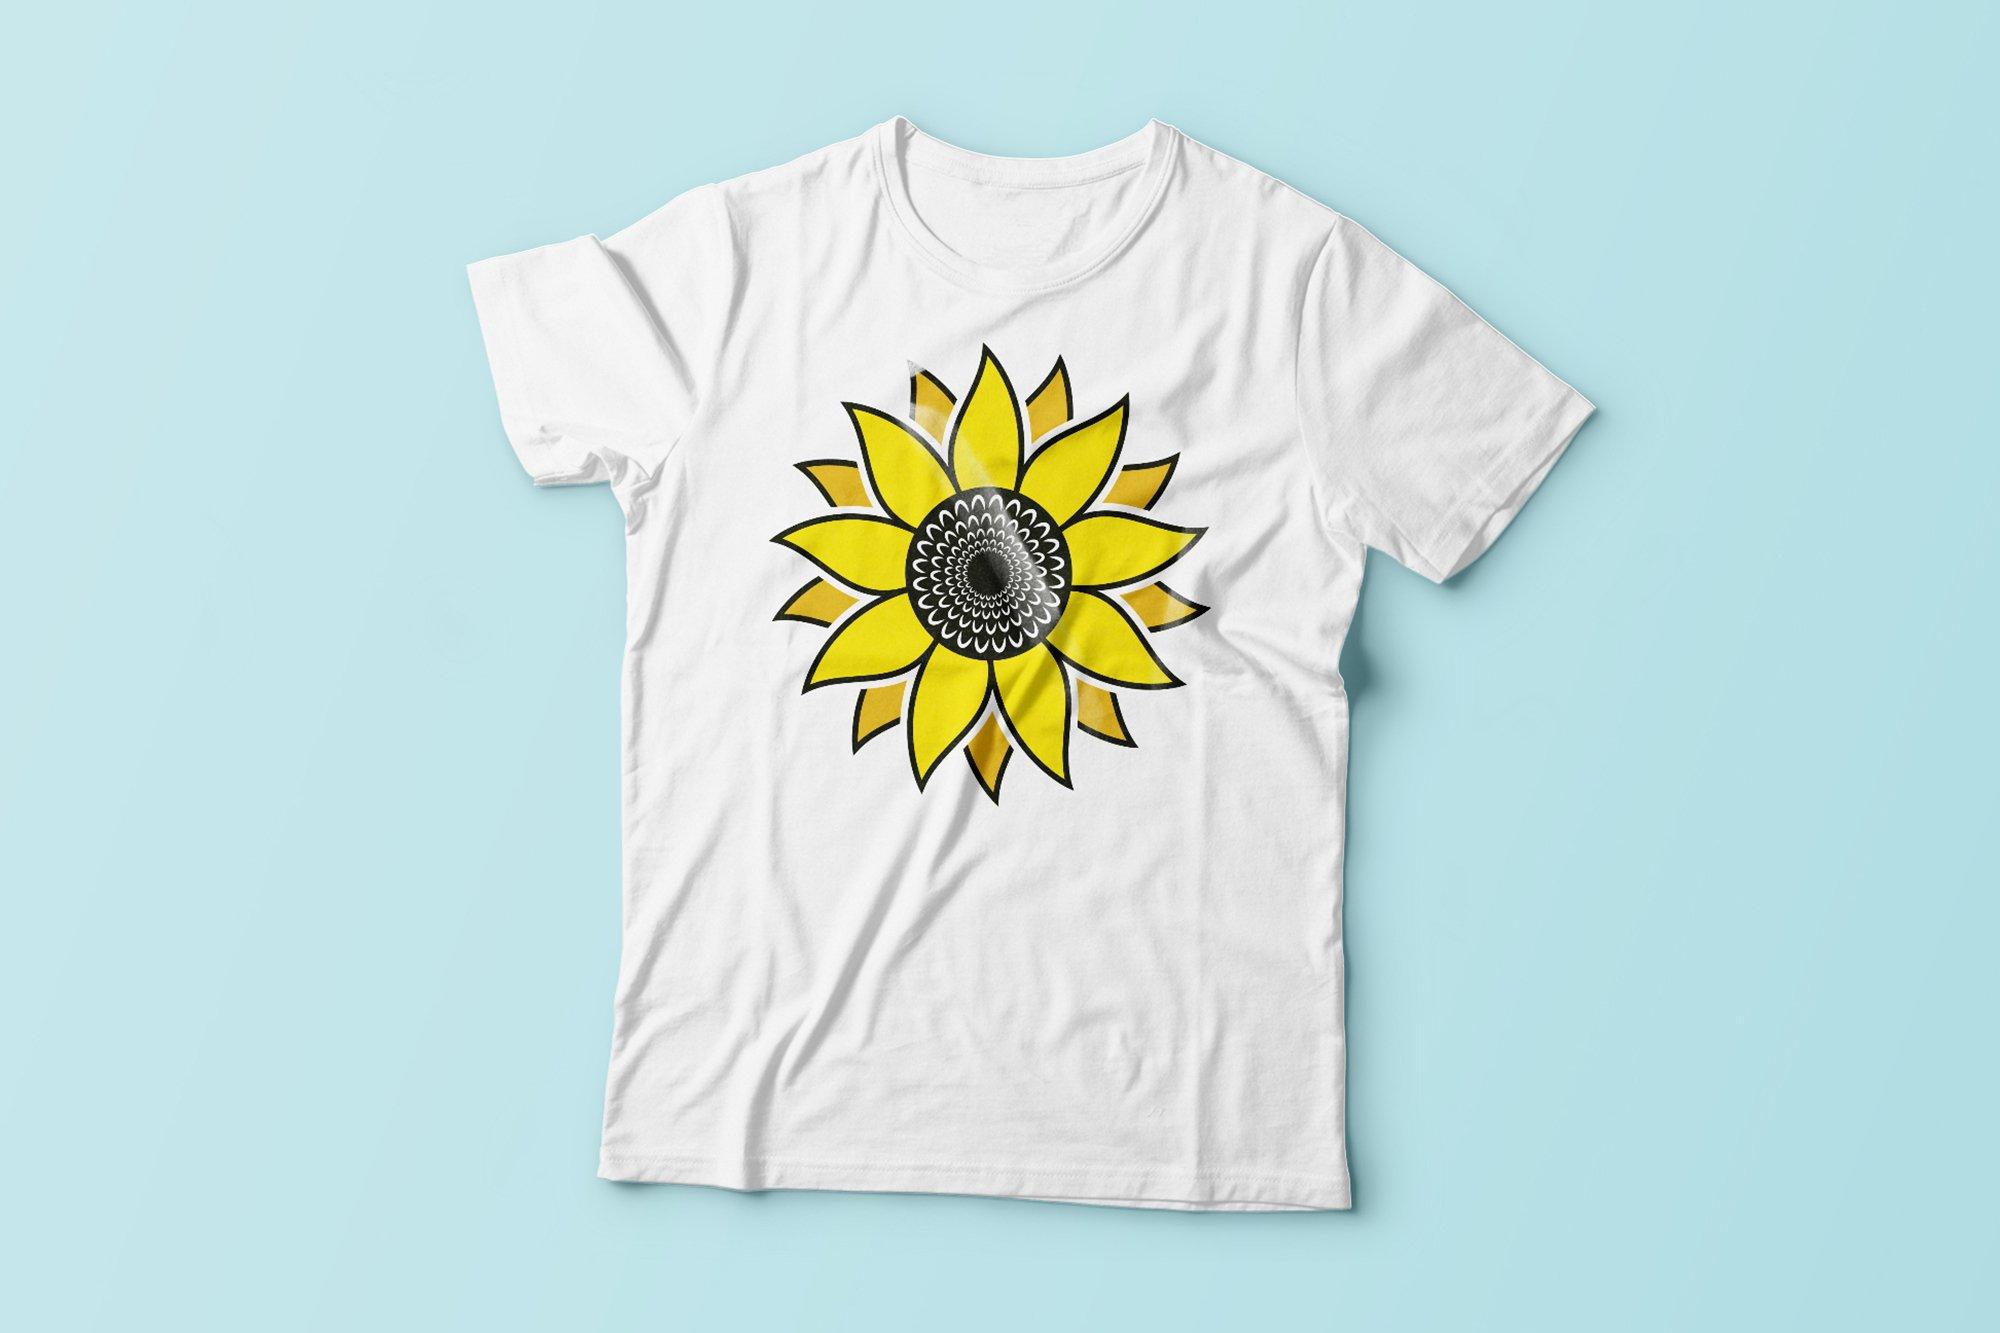 Sunflower SVG, Sunflower Clipart, Sunflower Monogram SVG example image 2